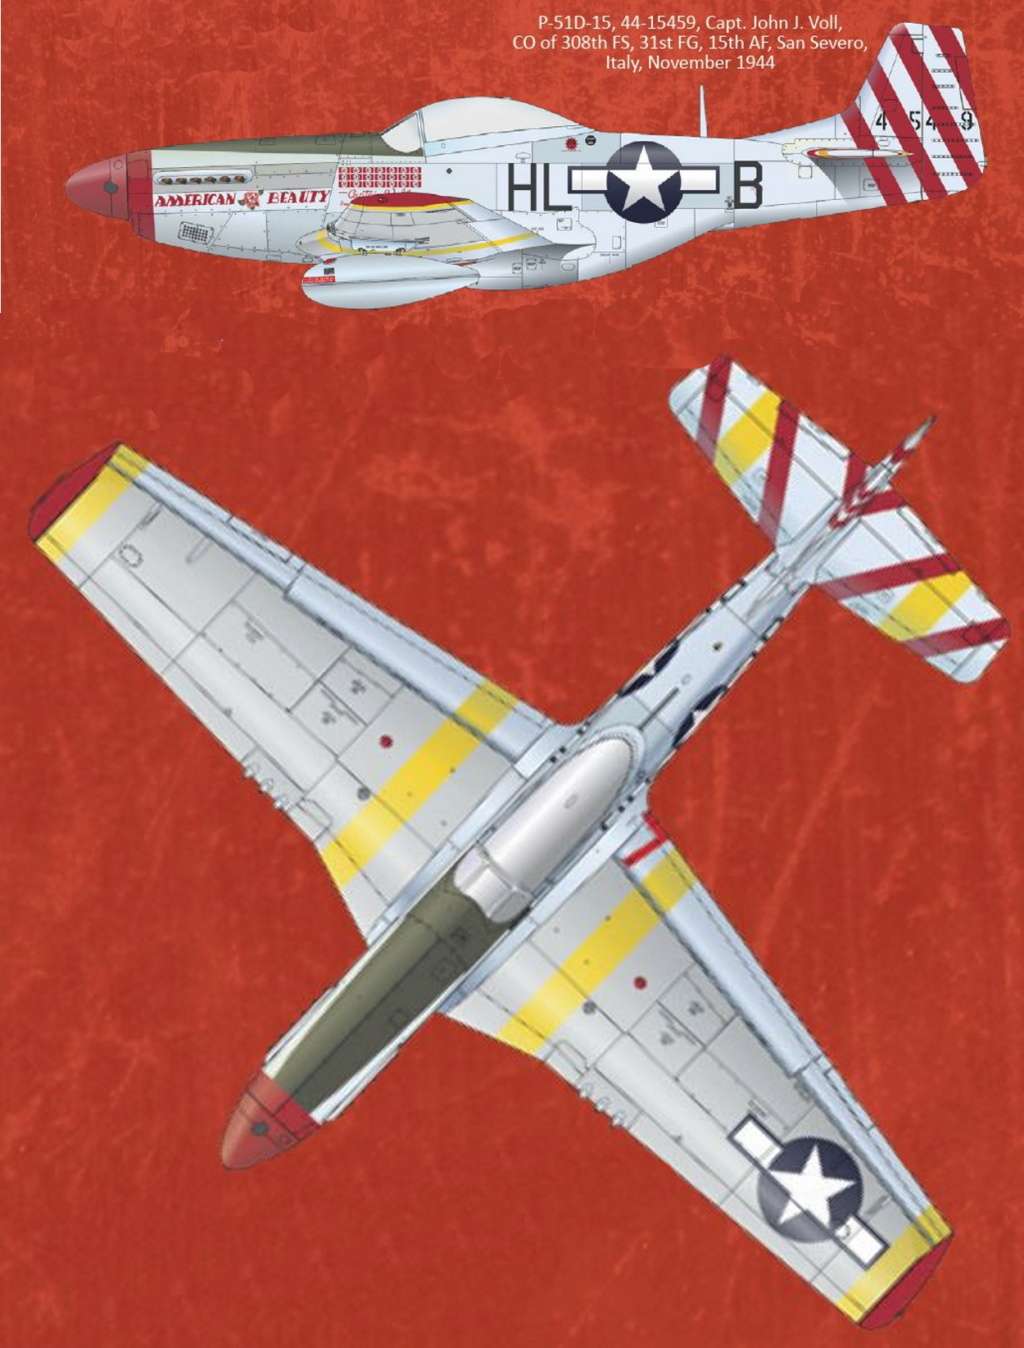 NORTH AMERICAN P-51 MUSTANG P51-5-13